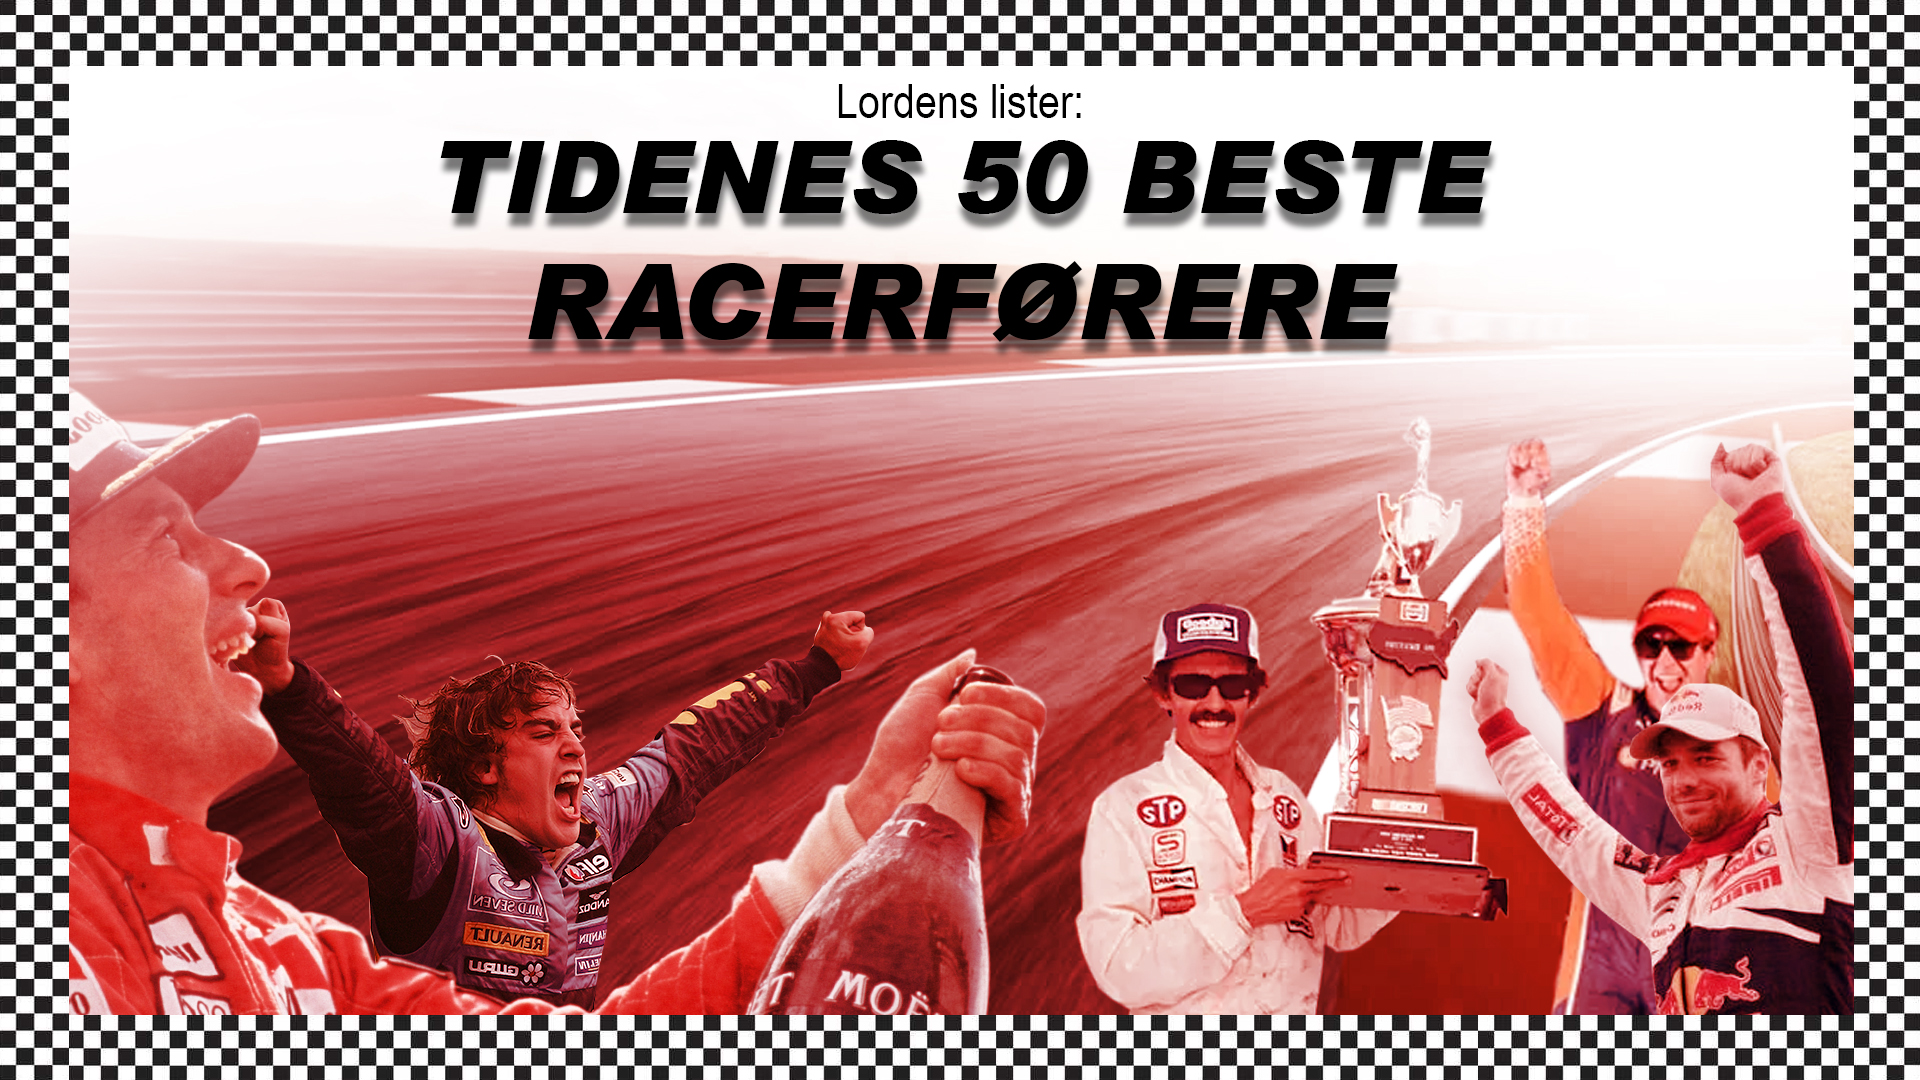 Ayrton Senna - Tidenes beste racerfører